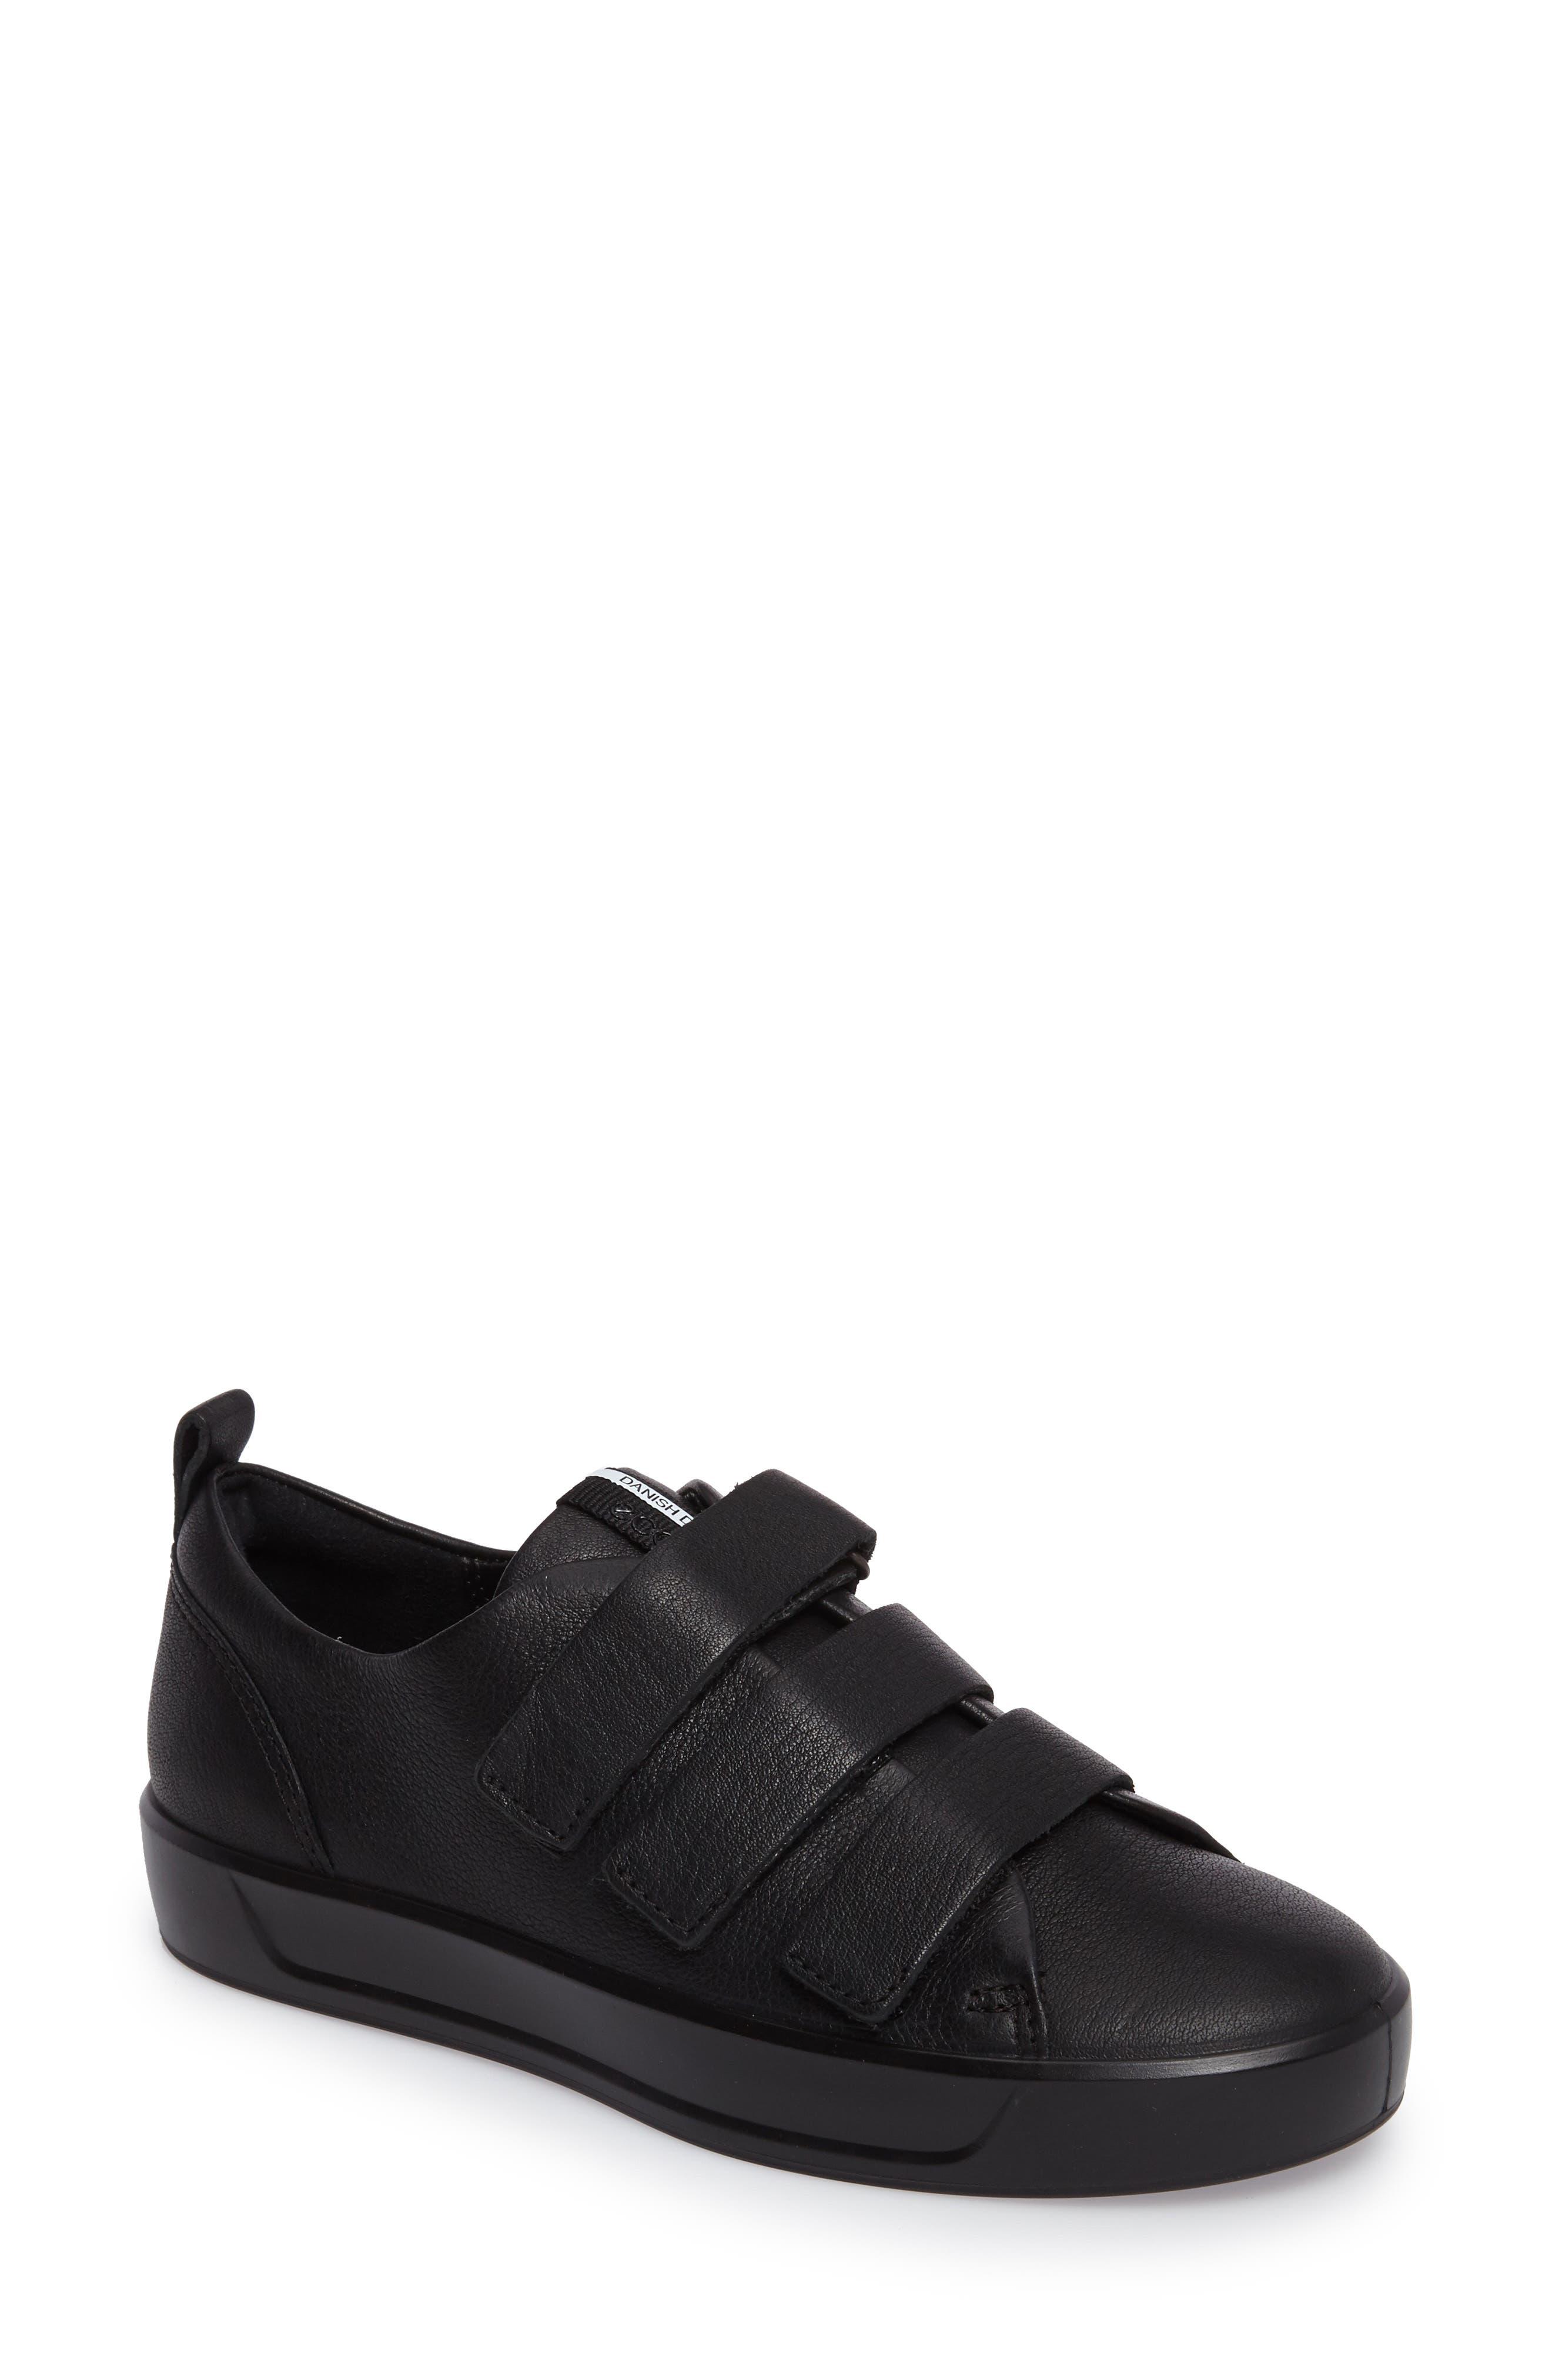 Soft 8 Sneaker,                             Main thumbnail 1, color,                             001